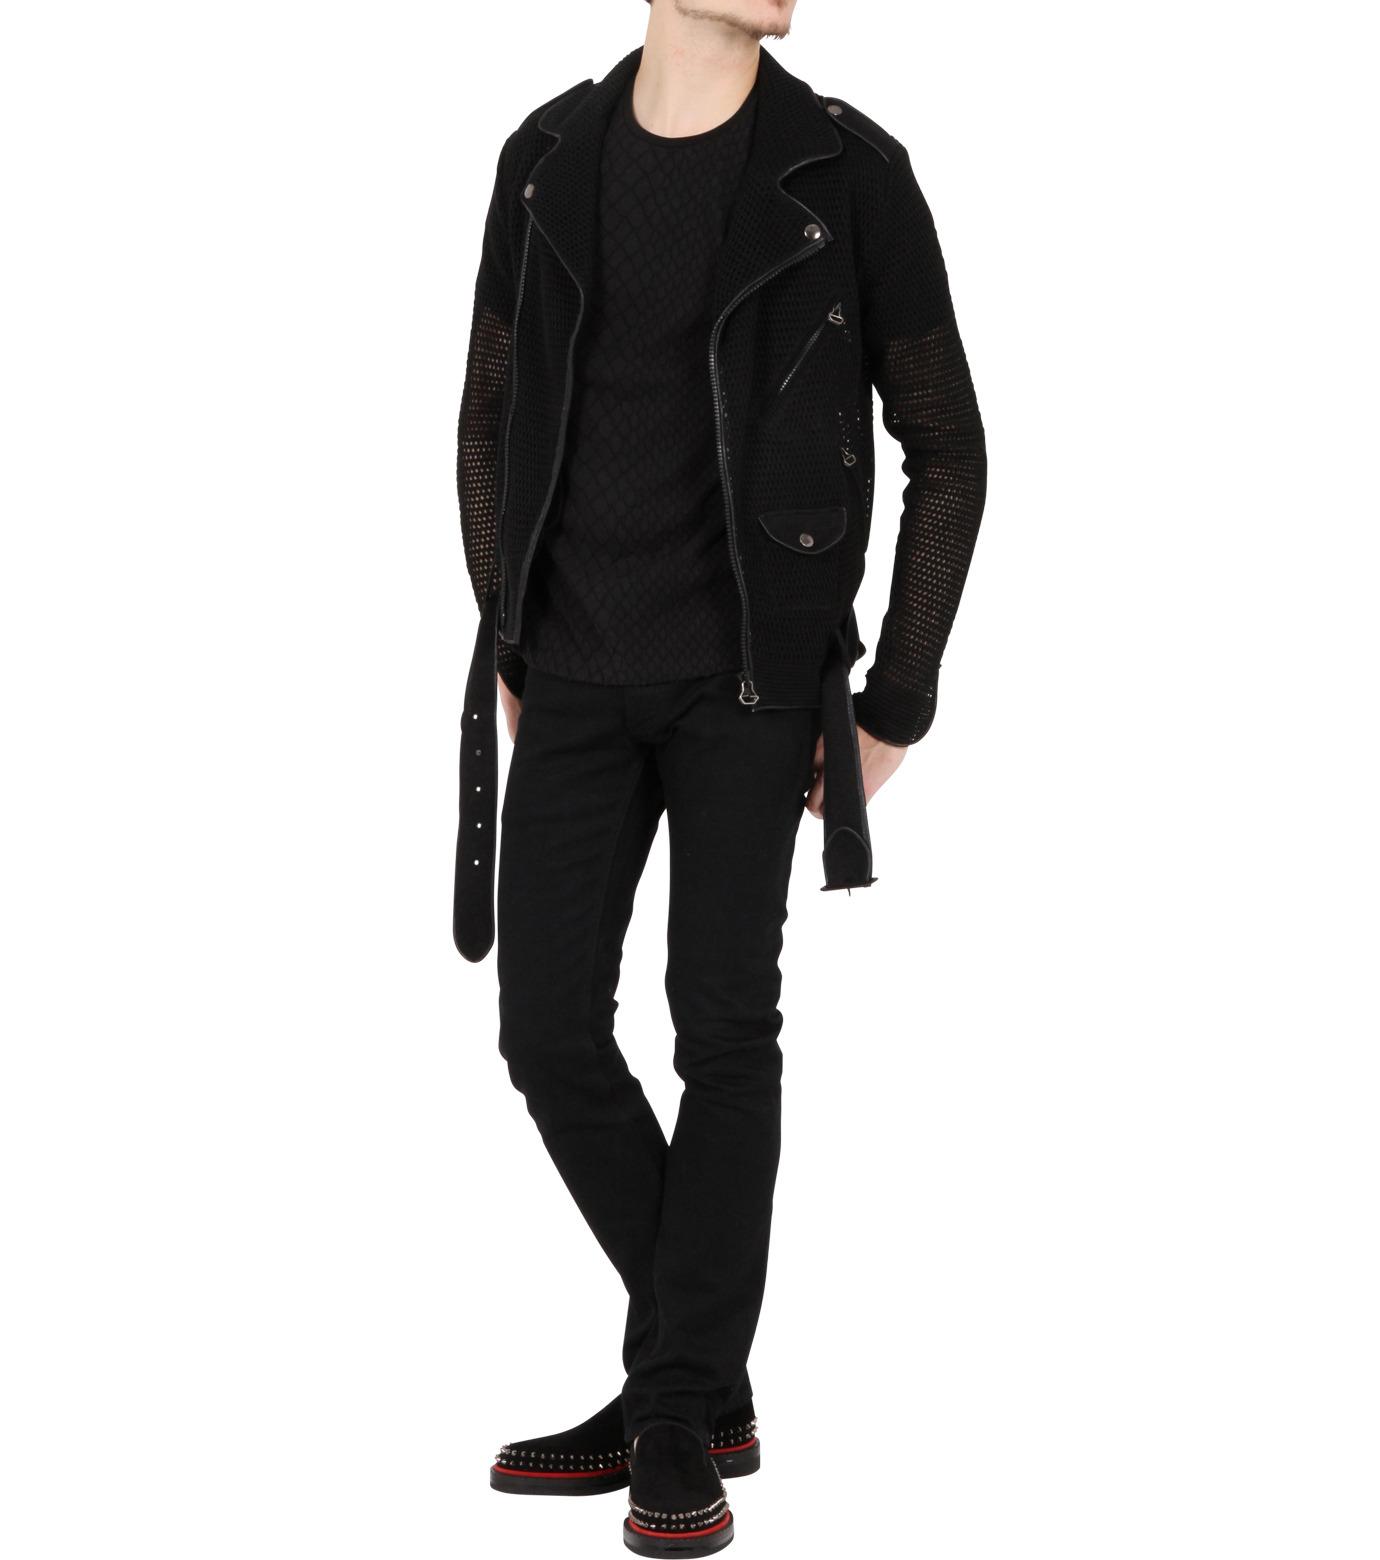 Miharayasuhiro(ミハラヤスヒロ)のLinen knit riders jacket-BLACK-9150-3537-13 拡大詳細画像3